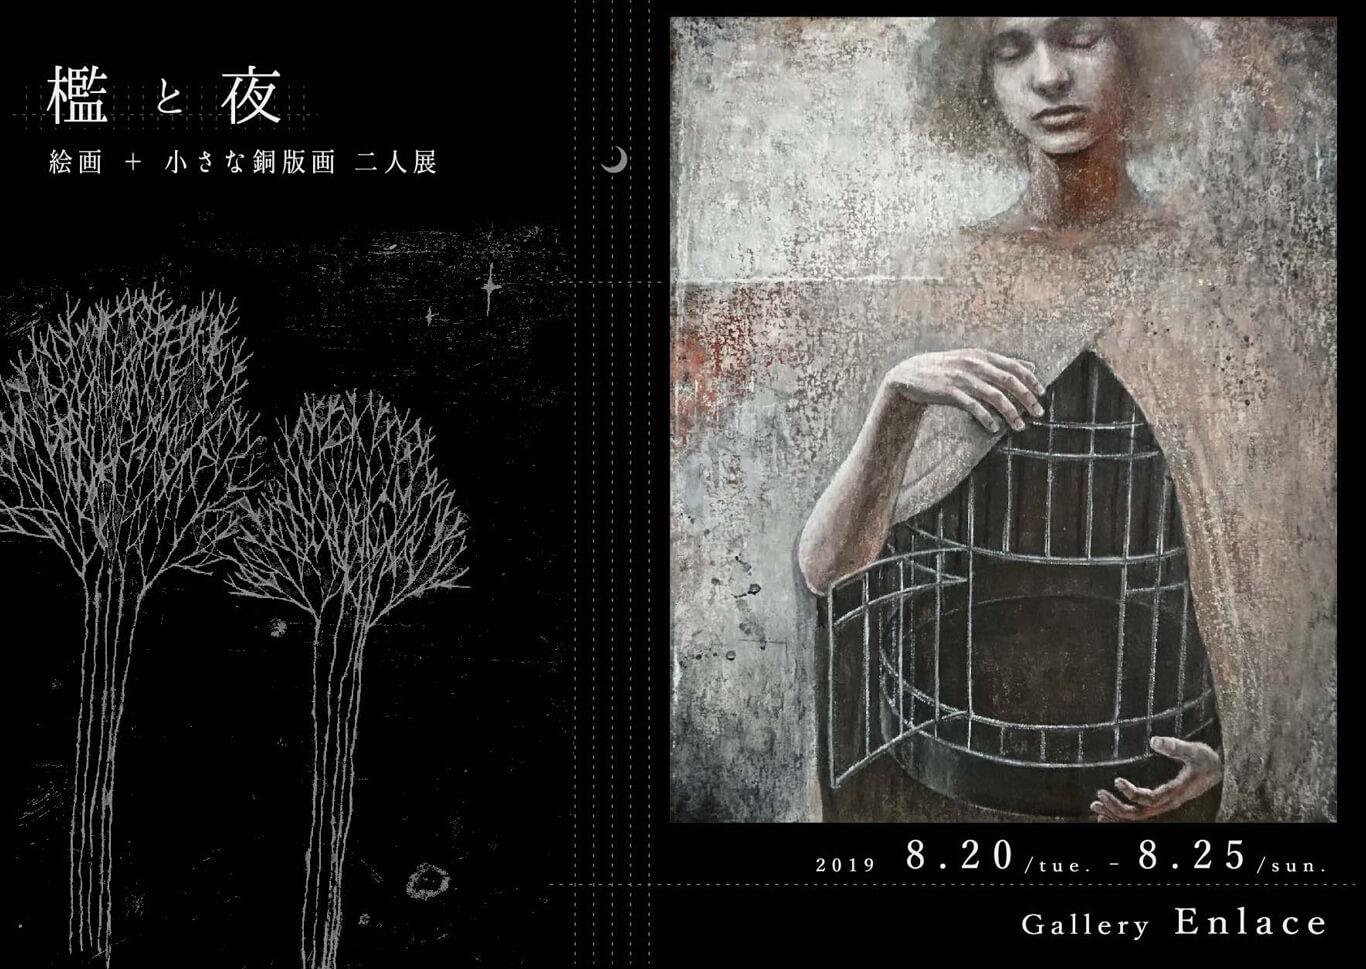 enlc-201908-德田 景-カンダ イスケ-展覧会